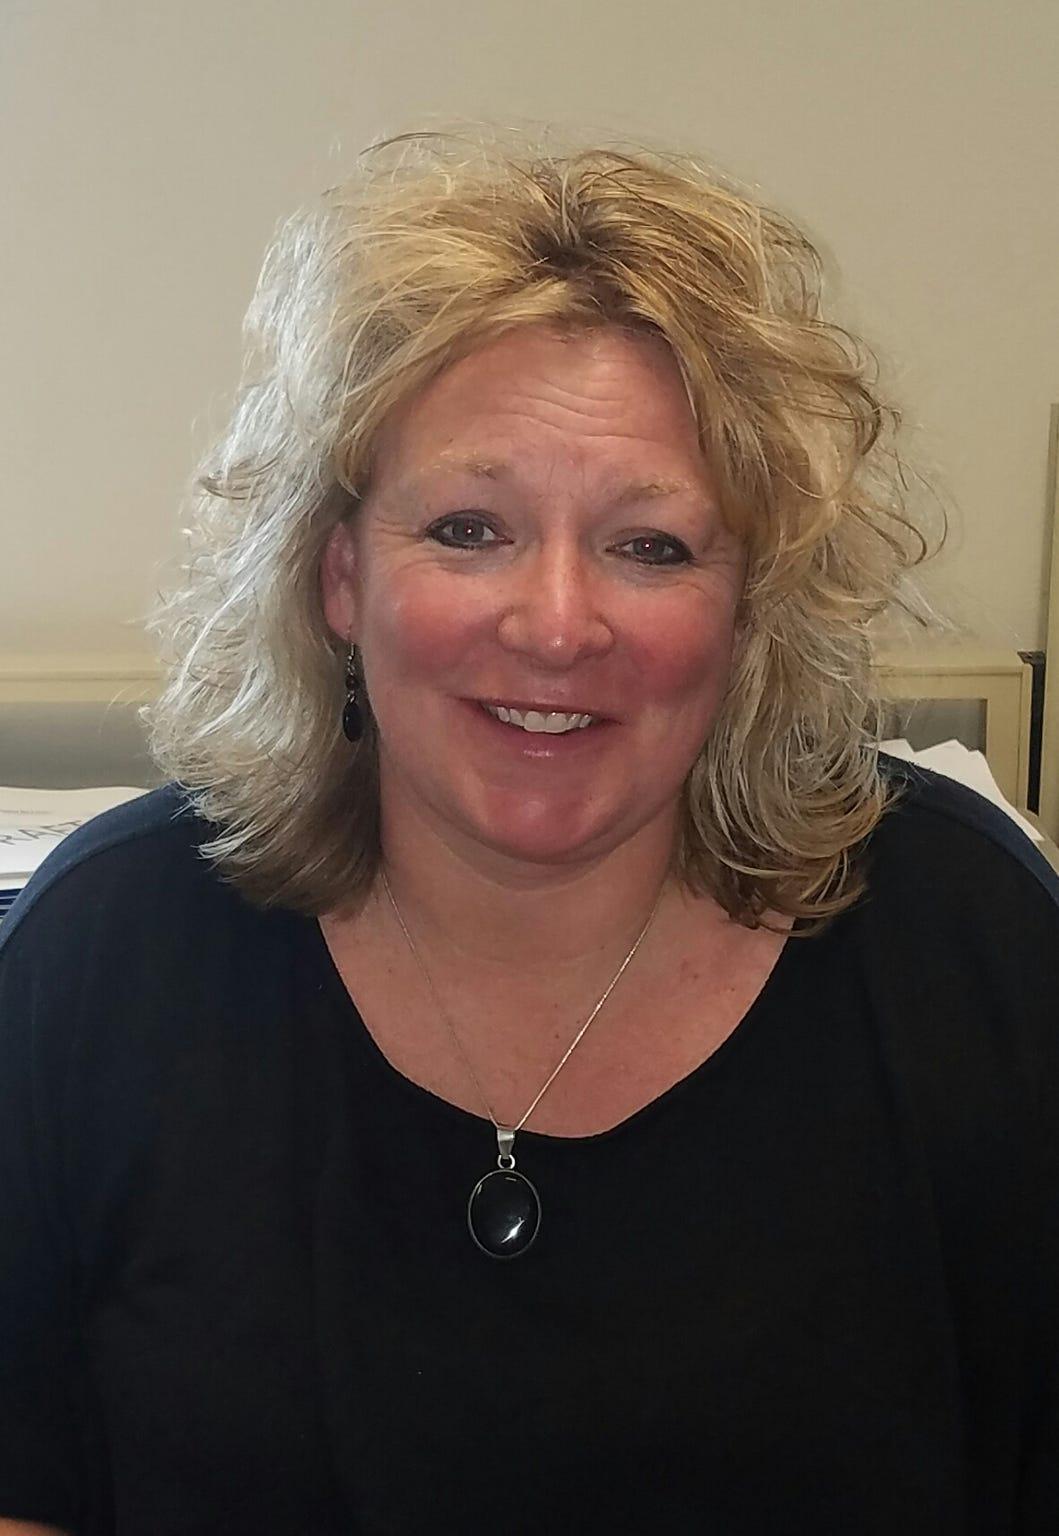 Dr. Ann Garvey of the Iowa Department of Public Health